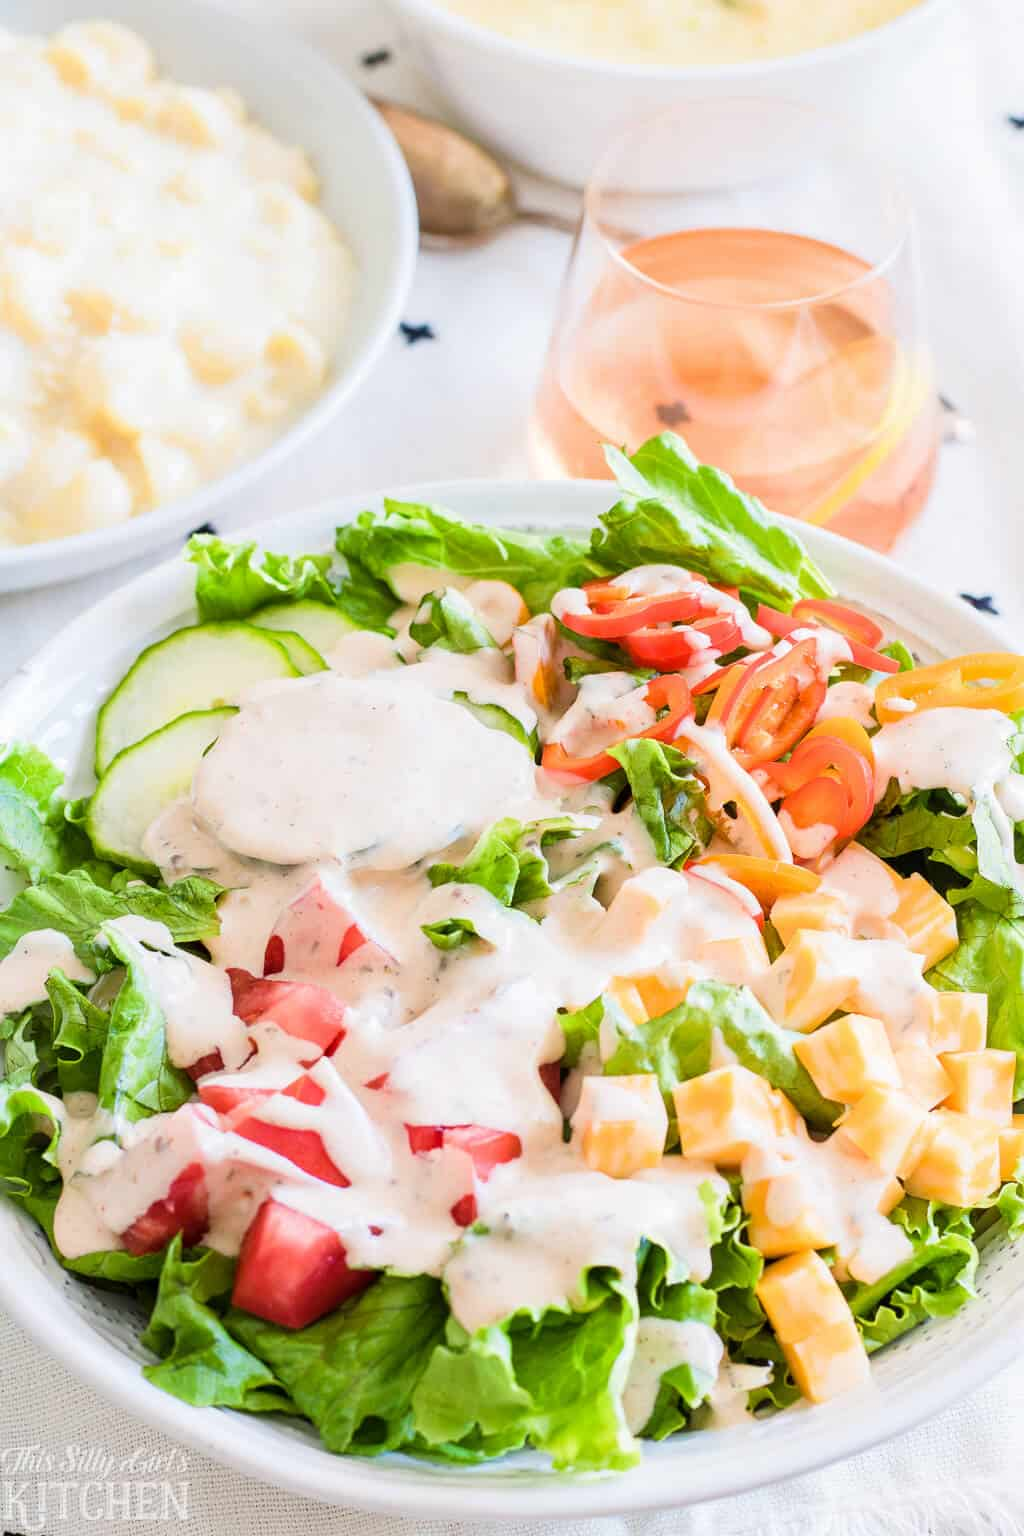 Garlic Salad Dressing, an easy, homemade dressing bursting with flavor!